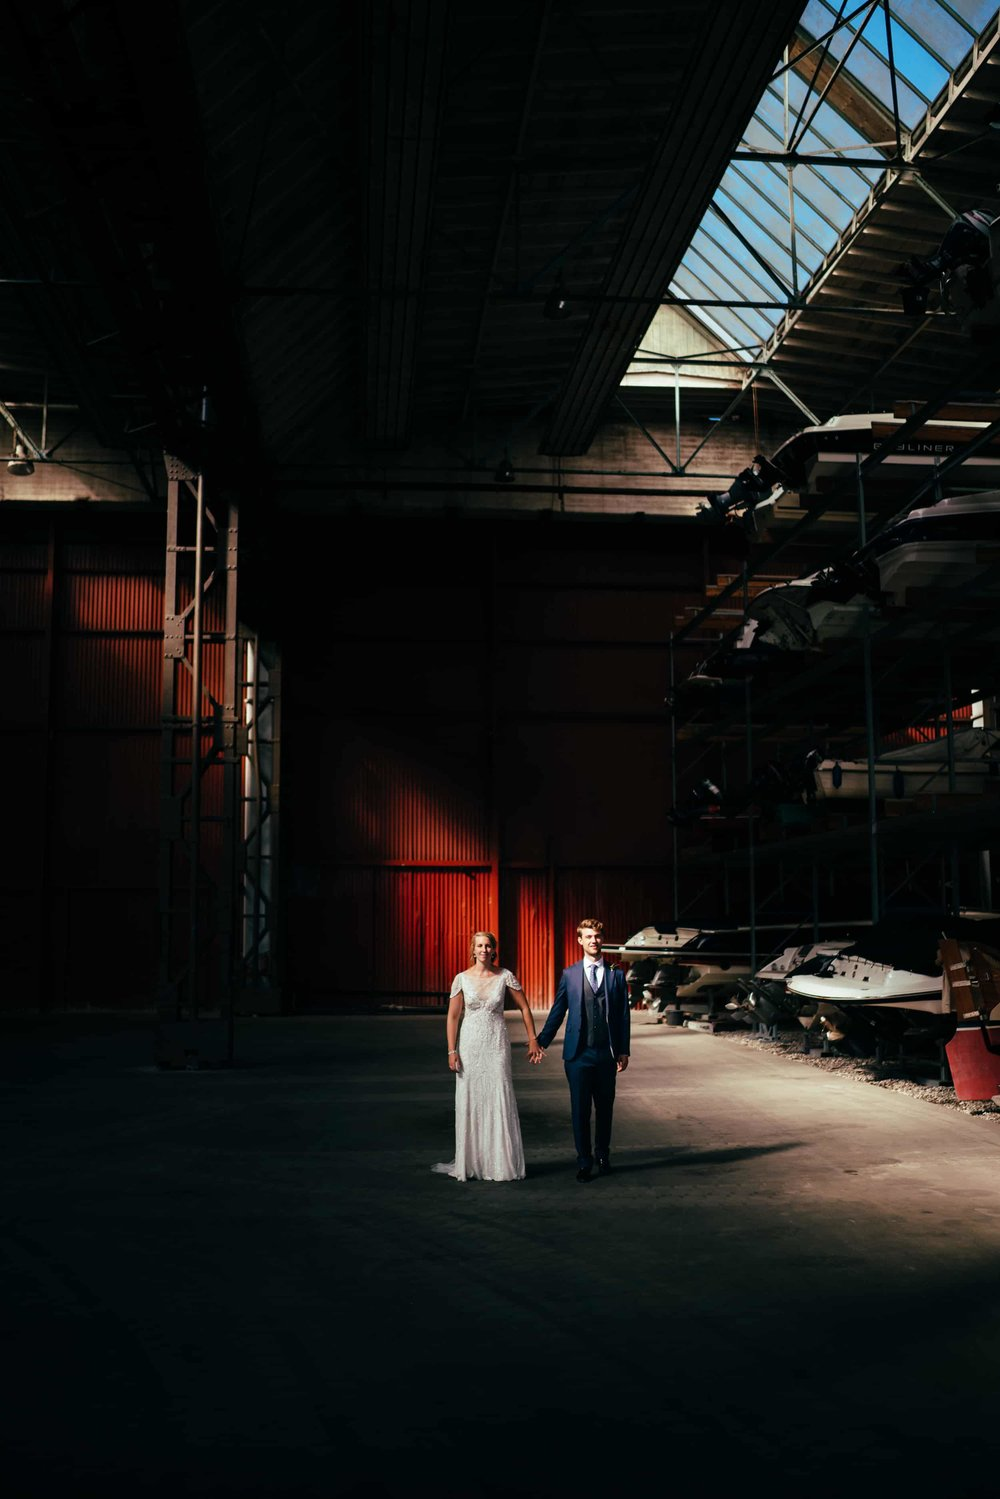 Industrielt-bryllupsportræt-i-københavn.jpg